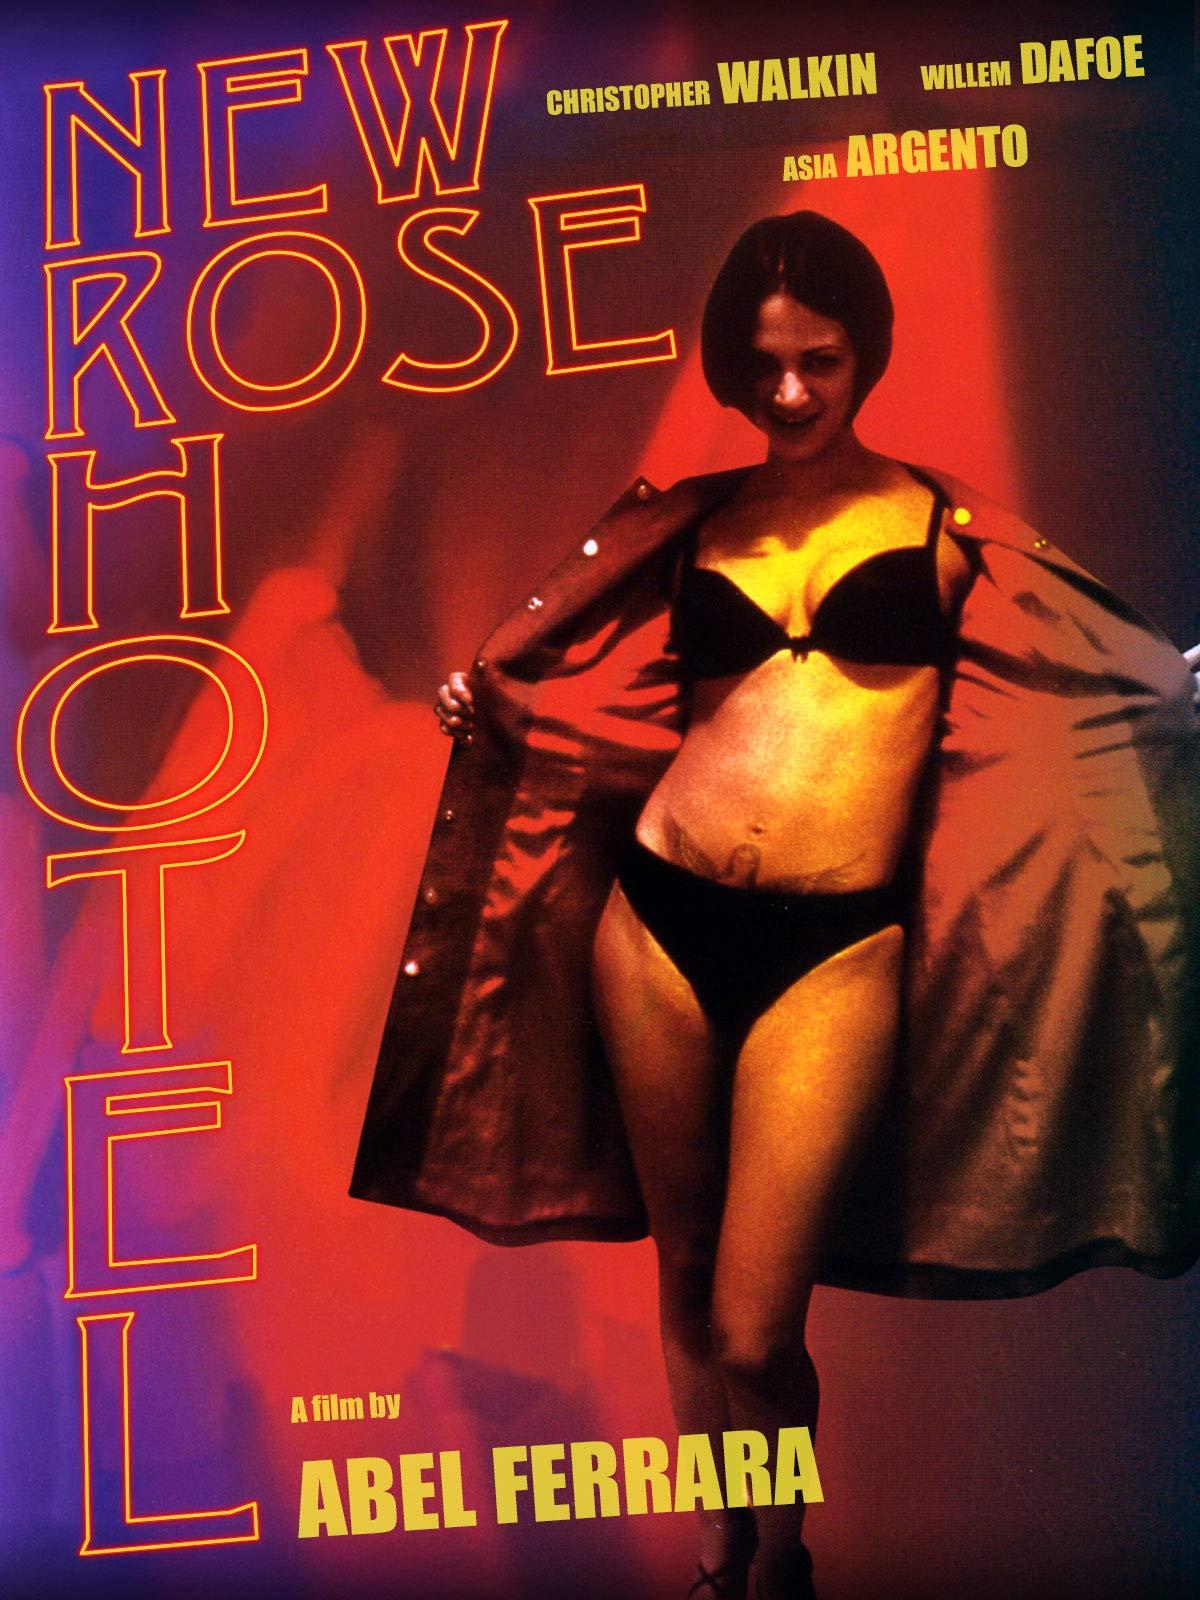 New Rose Hotel on Amazon Prime Video UK